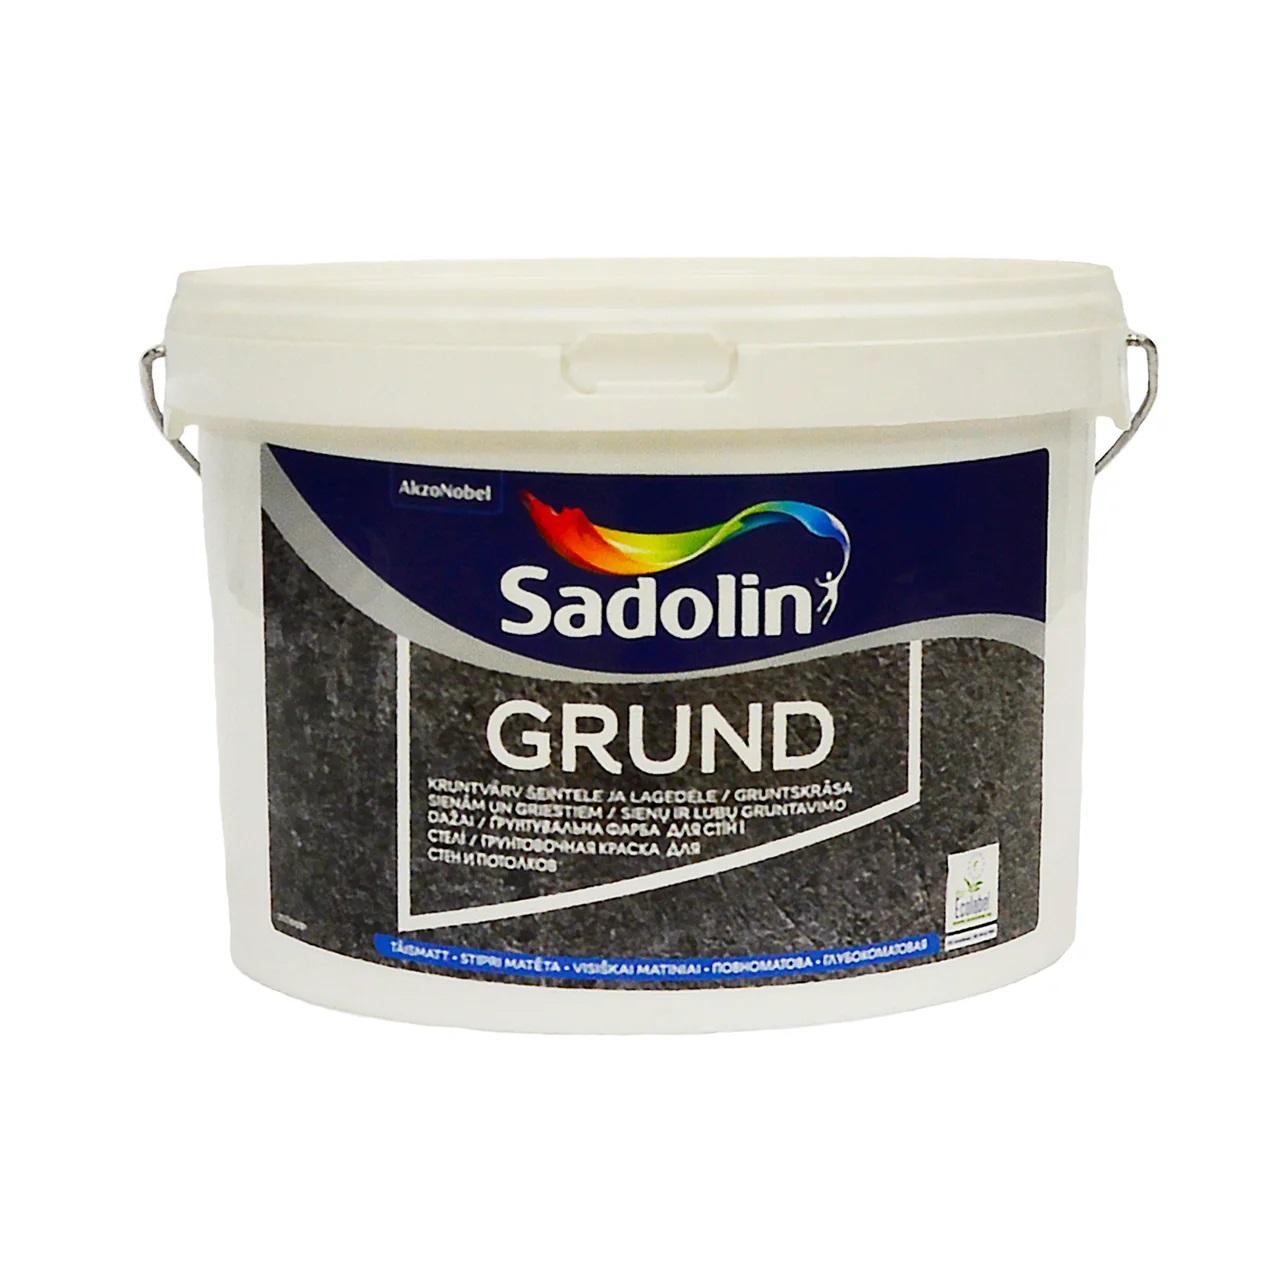 Sadolin Grund 5L